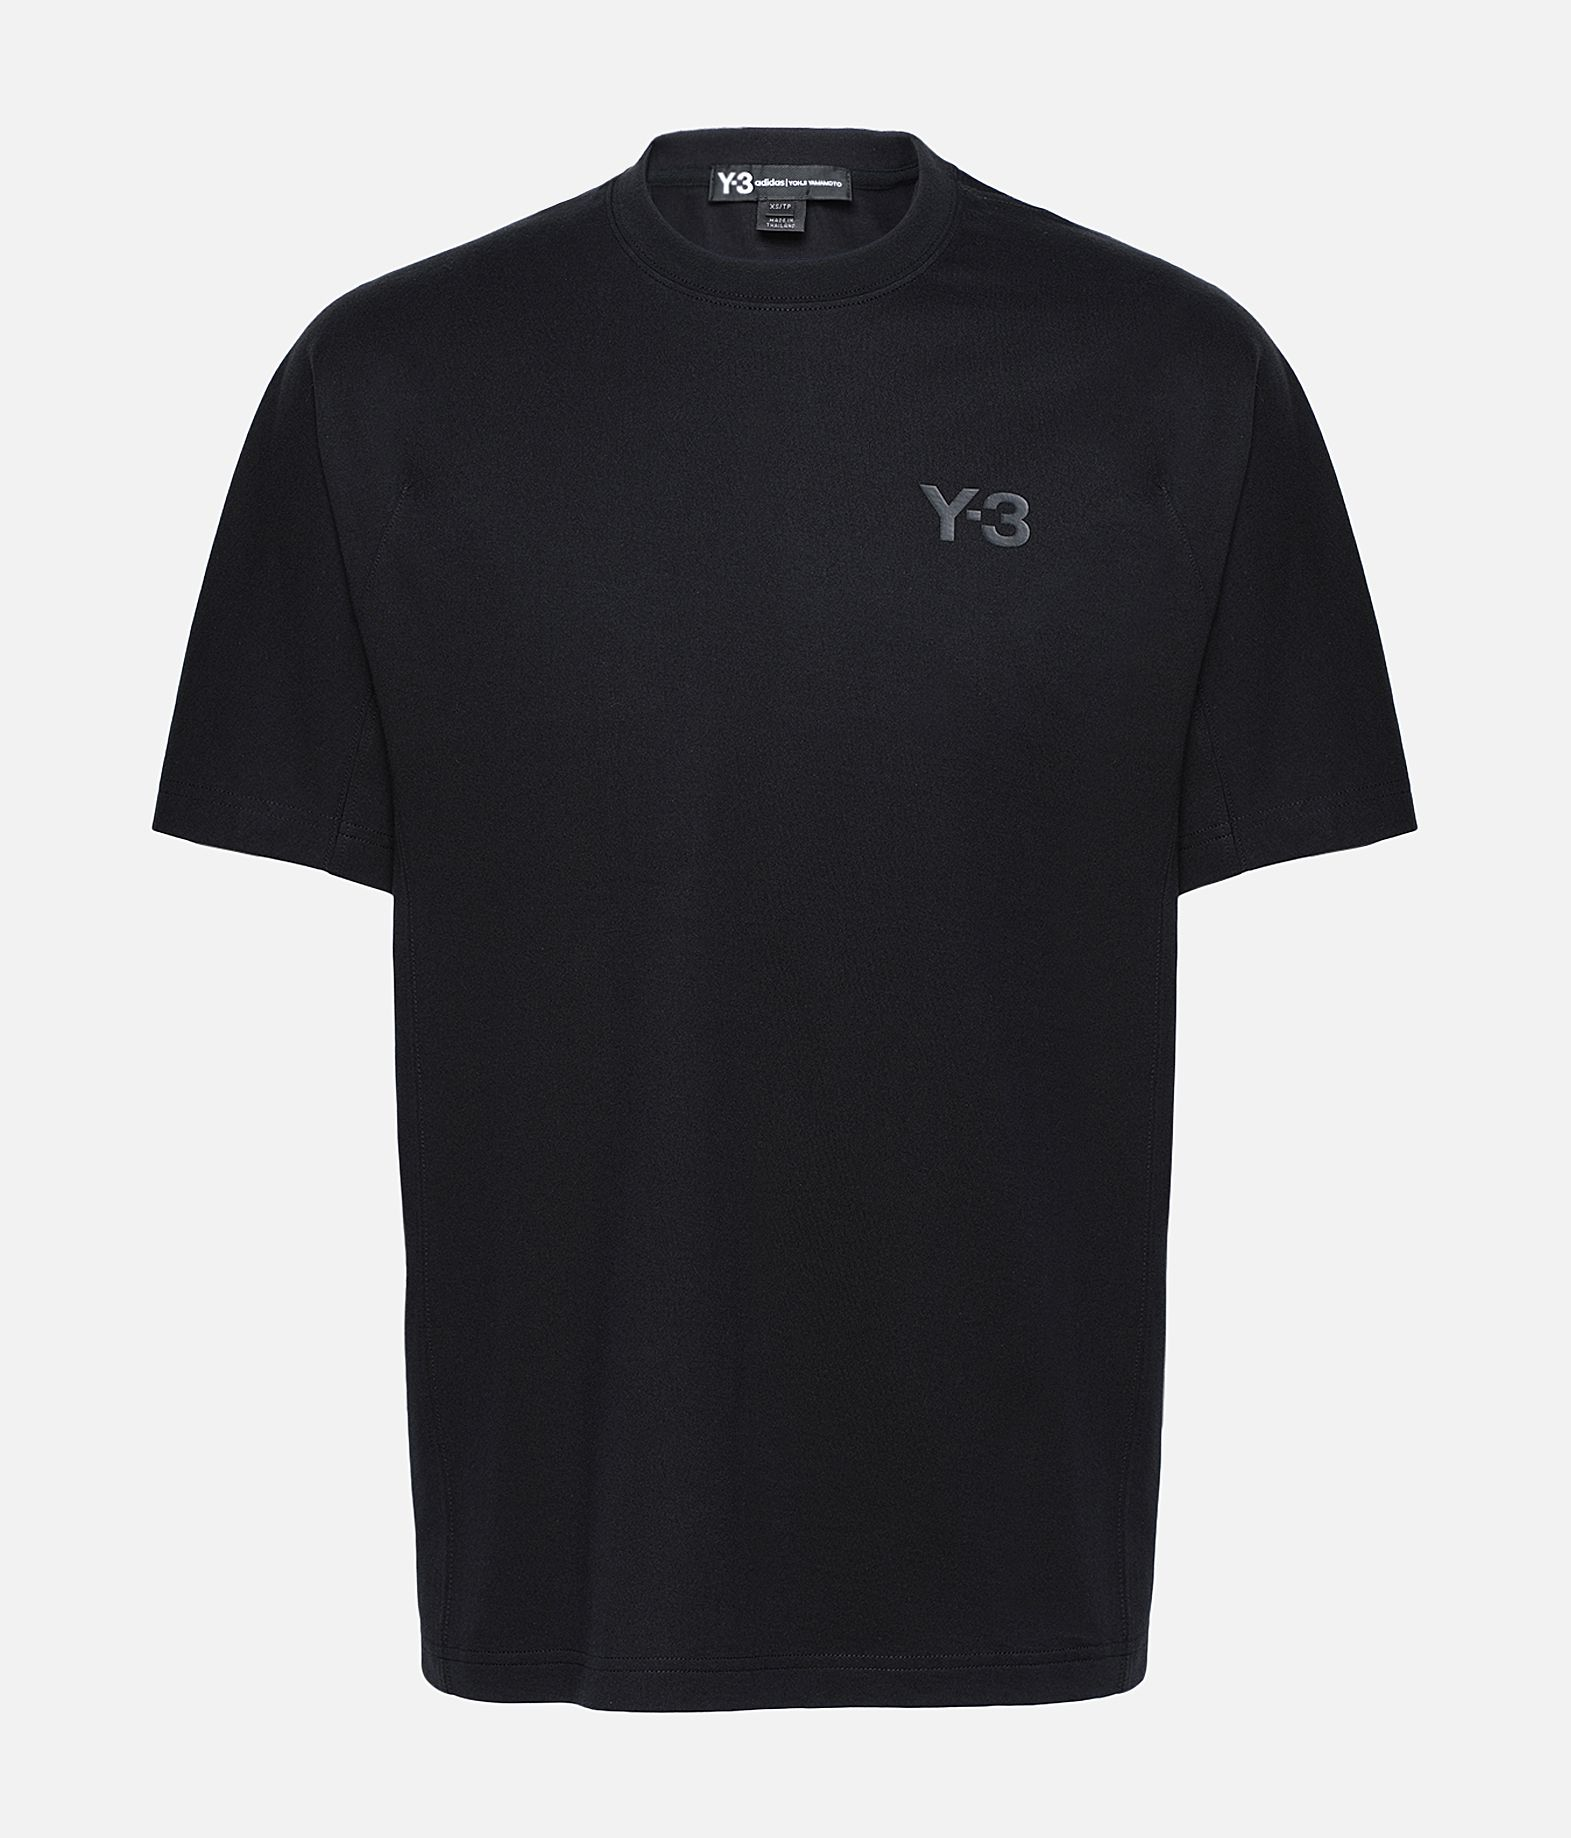 Y-3 Y-3 Graphic Tee Short sleeve t-shirt Man f